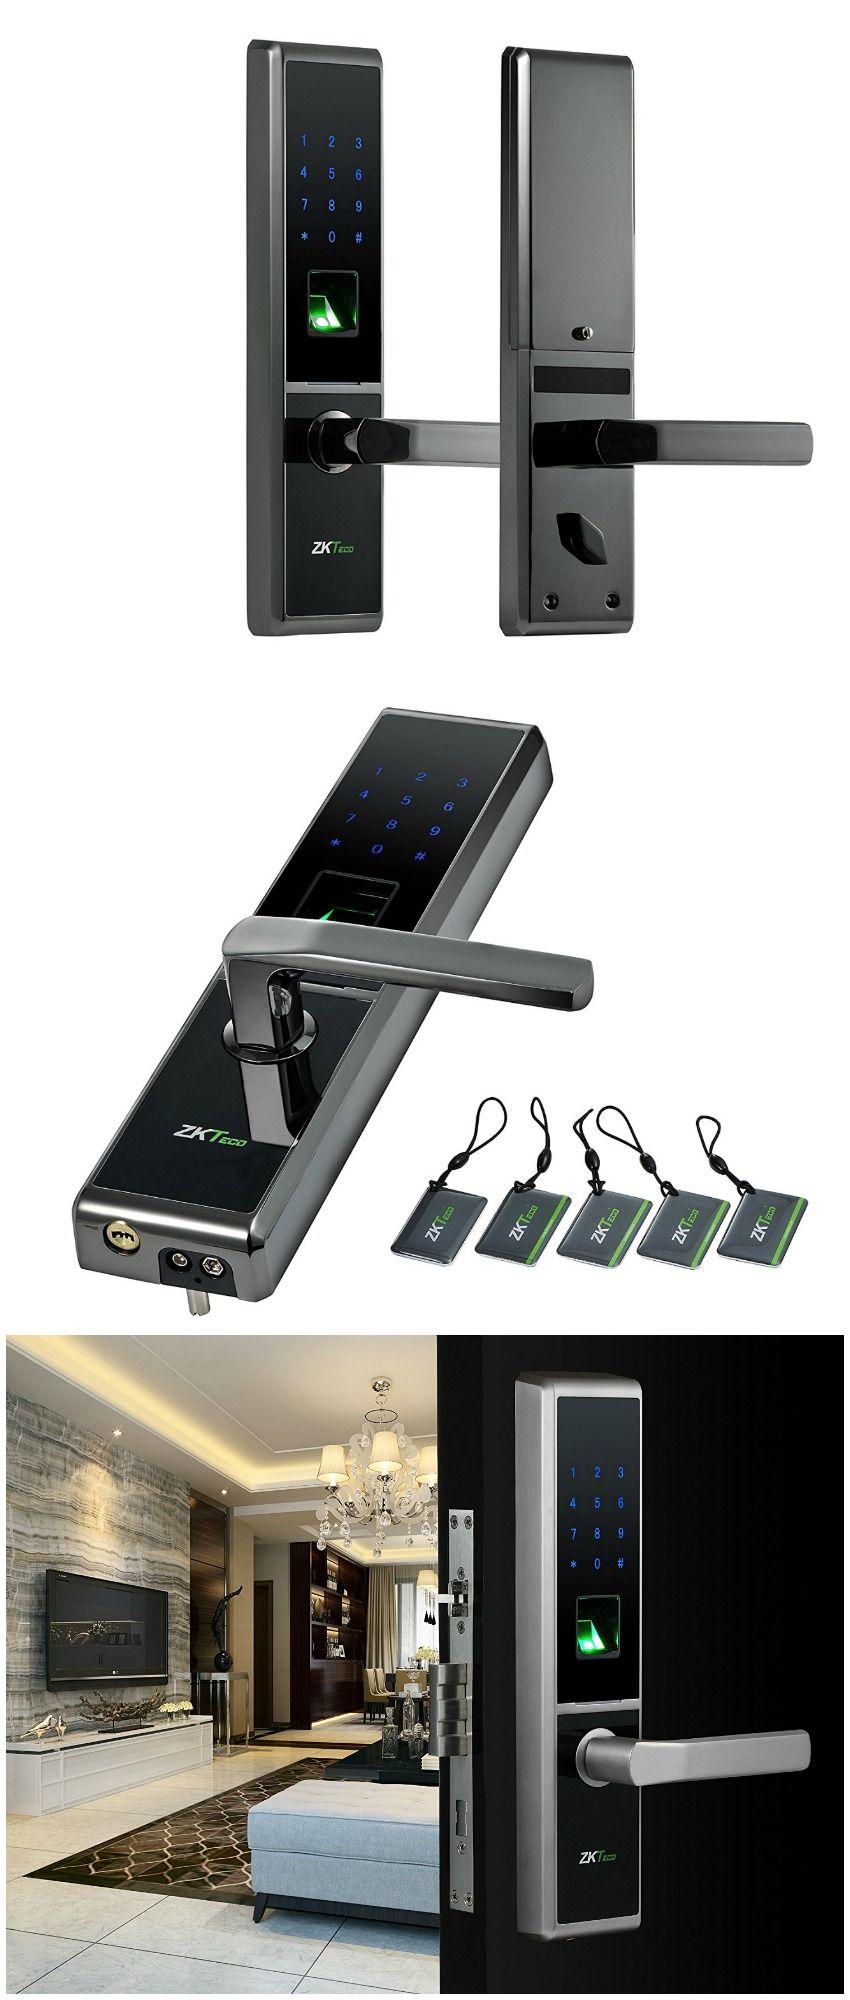 Keypad Biometric Fingerprint Door Lock Use Fingerprint Keypad Rfid Tag Or Key To Unlock Your Choice Affili Smart Home Automation Home Upgrades Home Tech